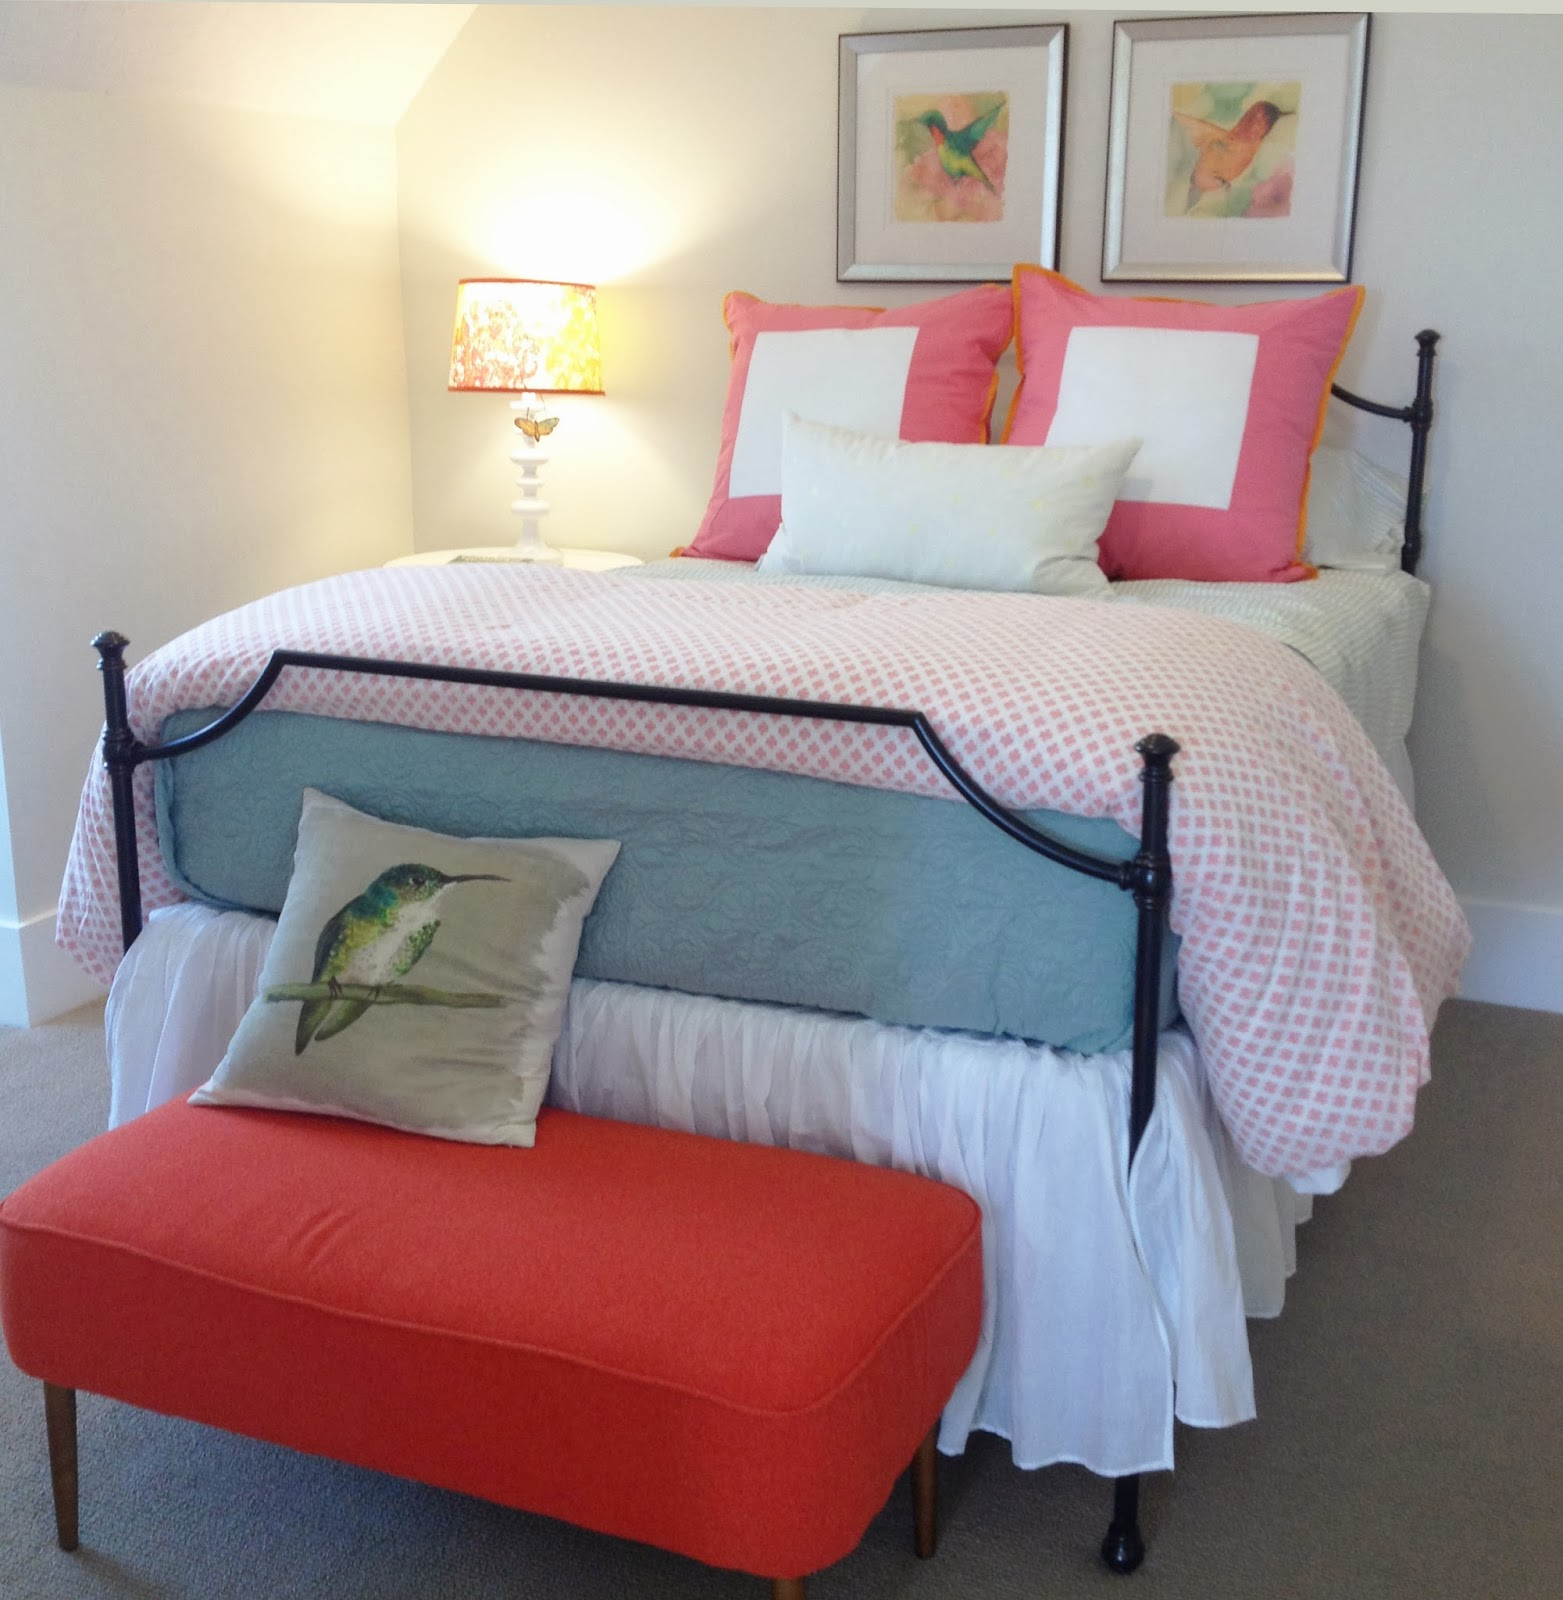 Room Recipes: A Creative, Stylish Guide To Interior Design